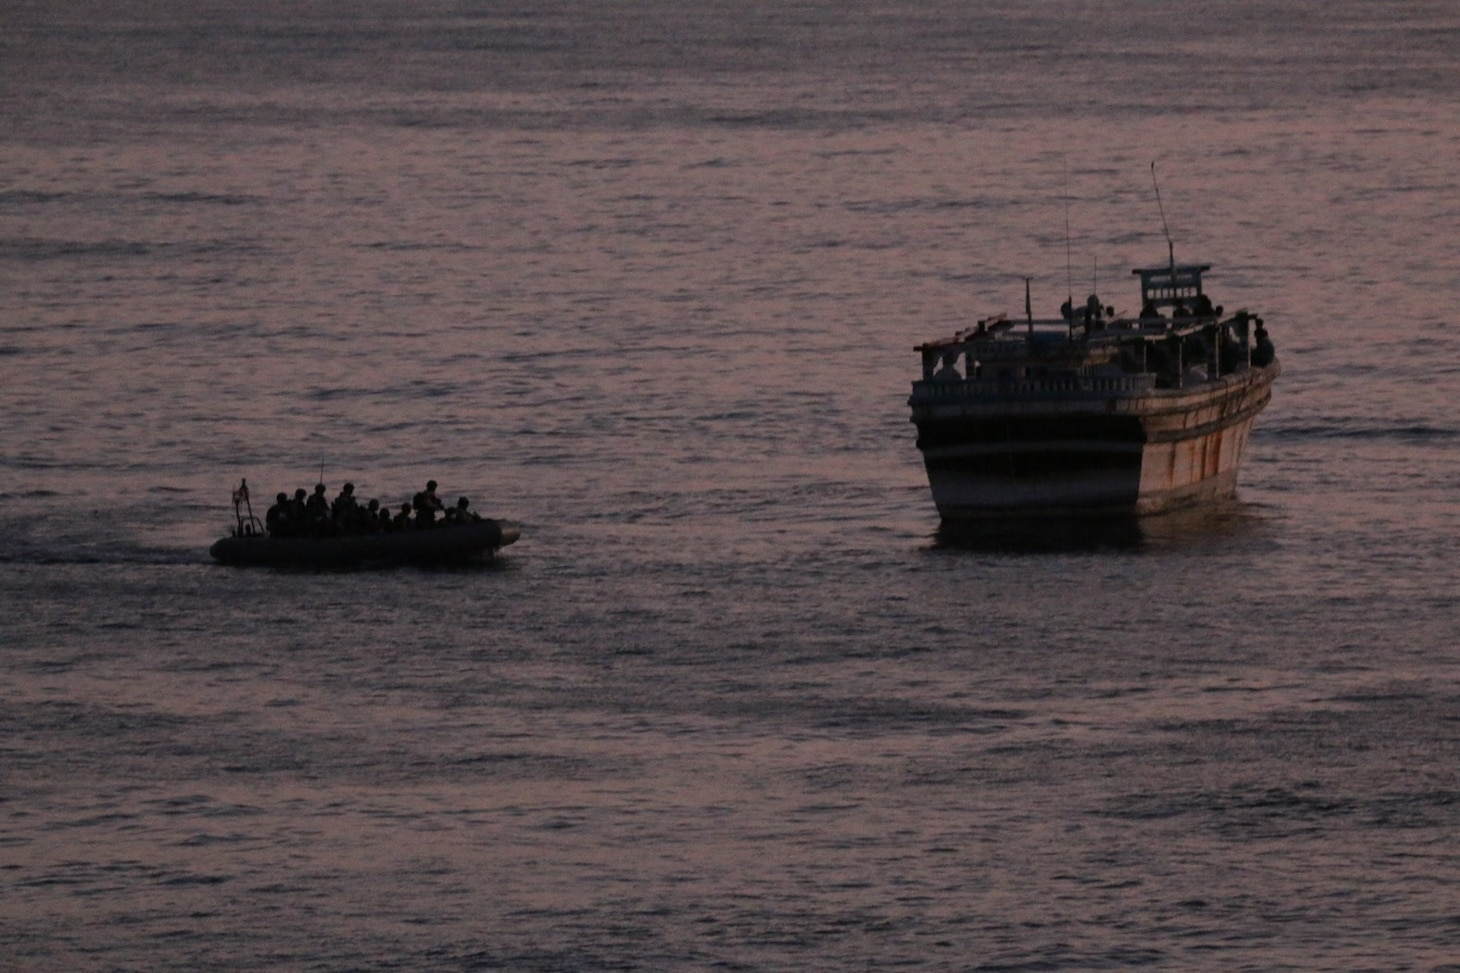 USS Churchill Rescue in Arabian Sea